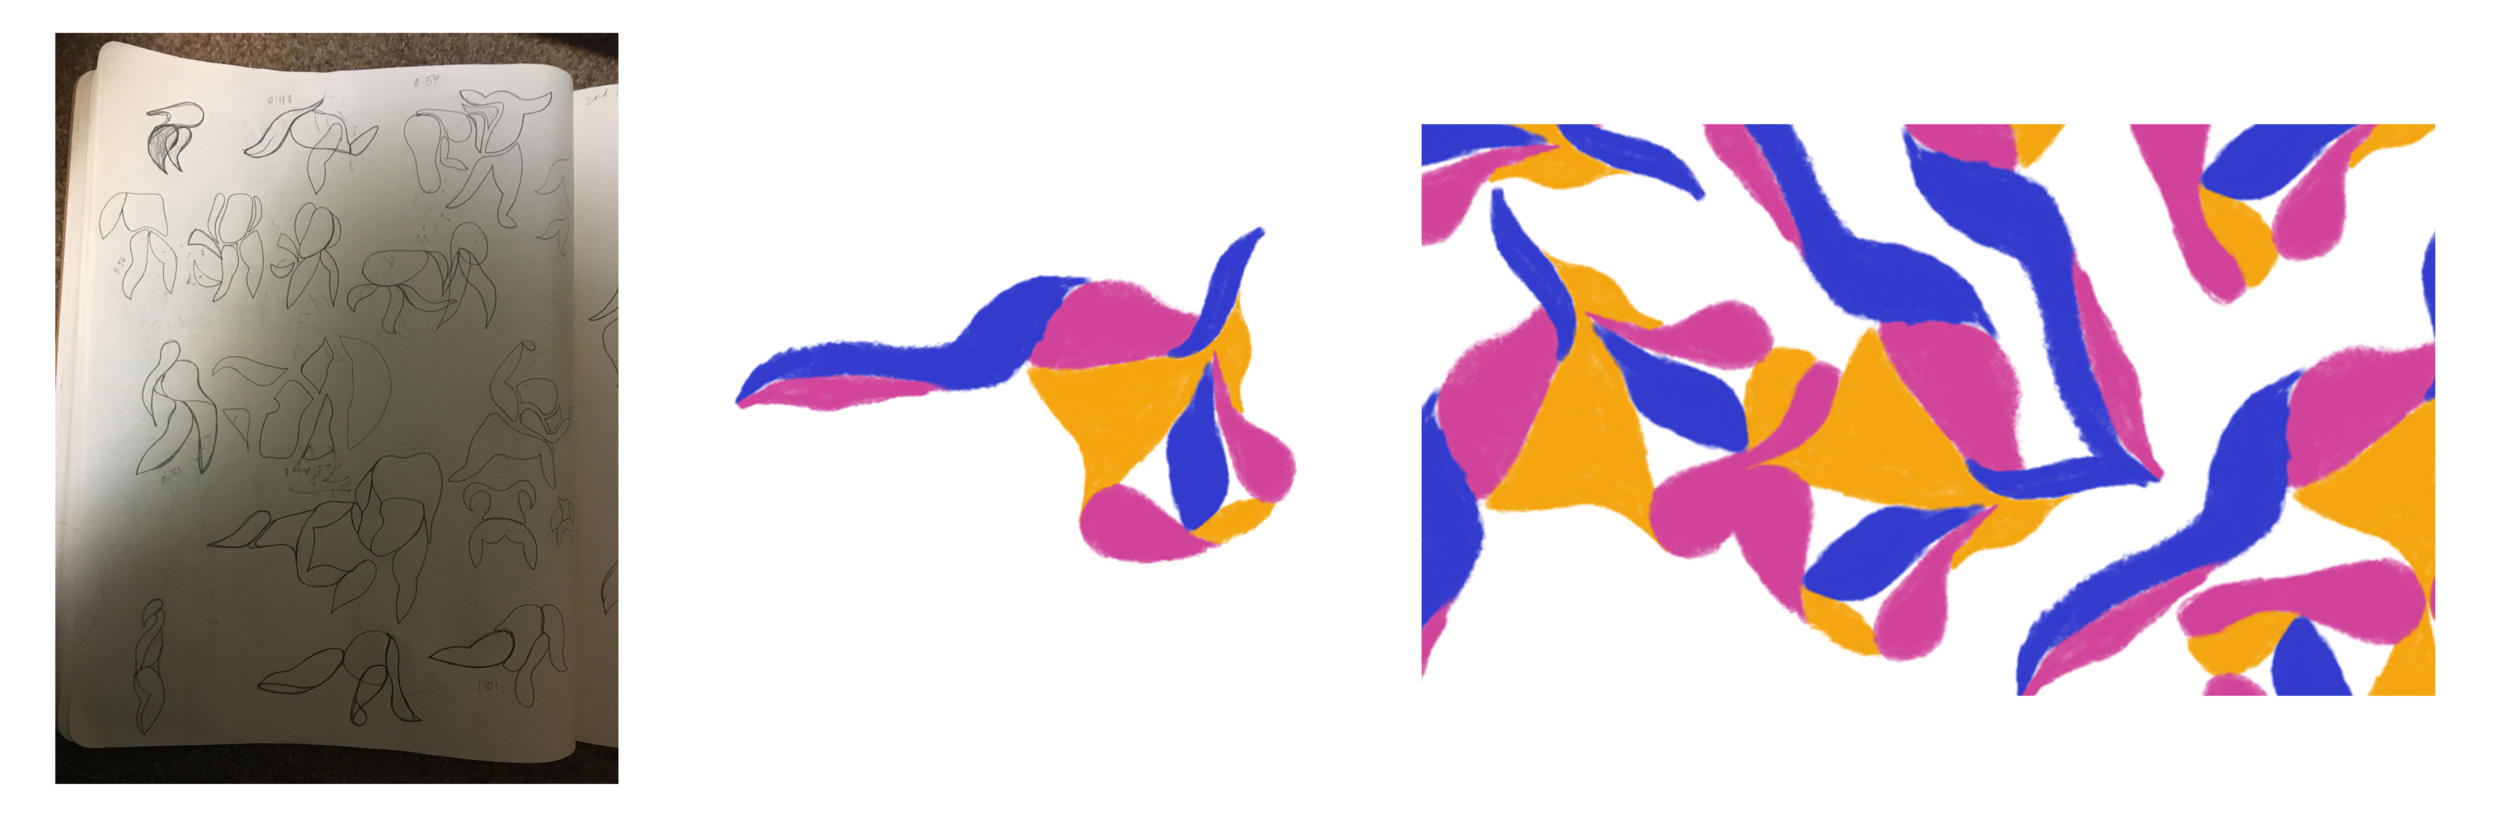 process-pattern3.png